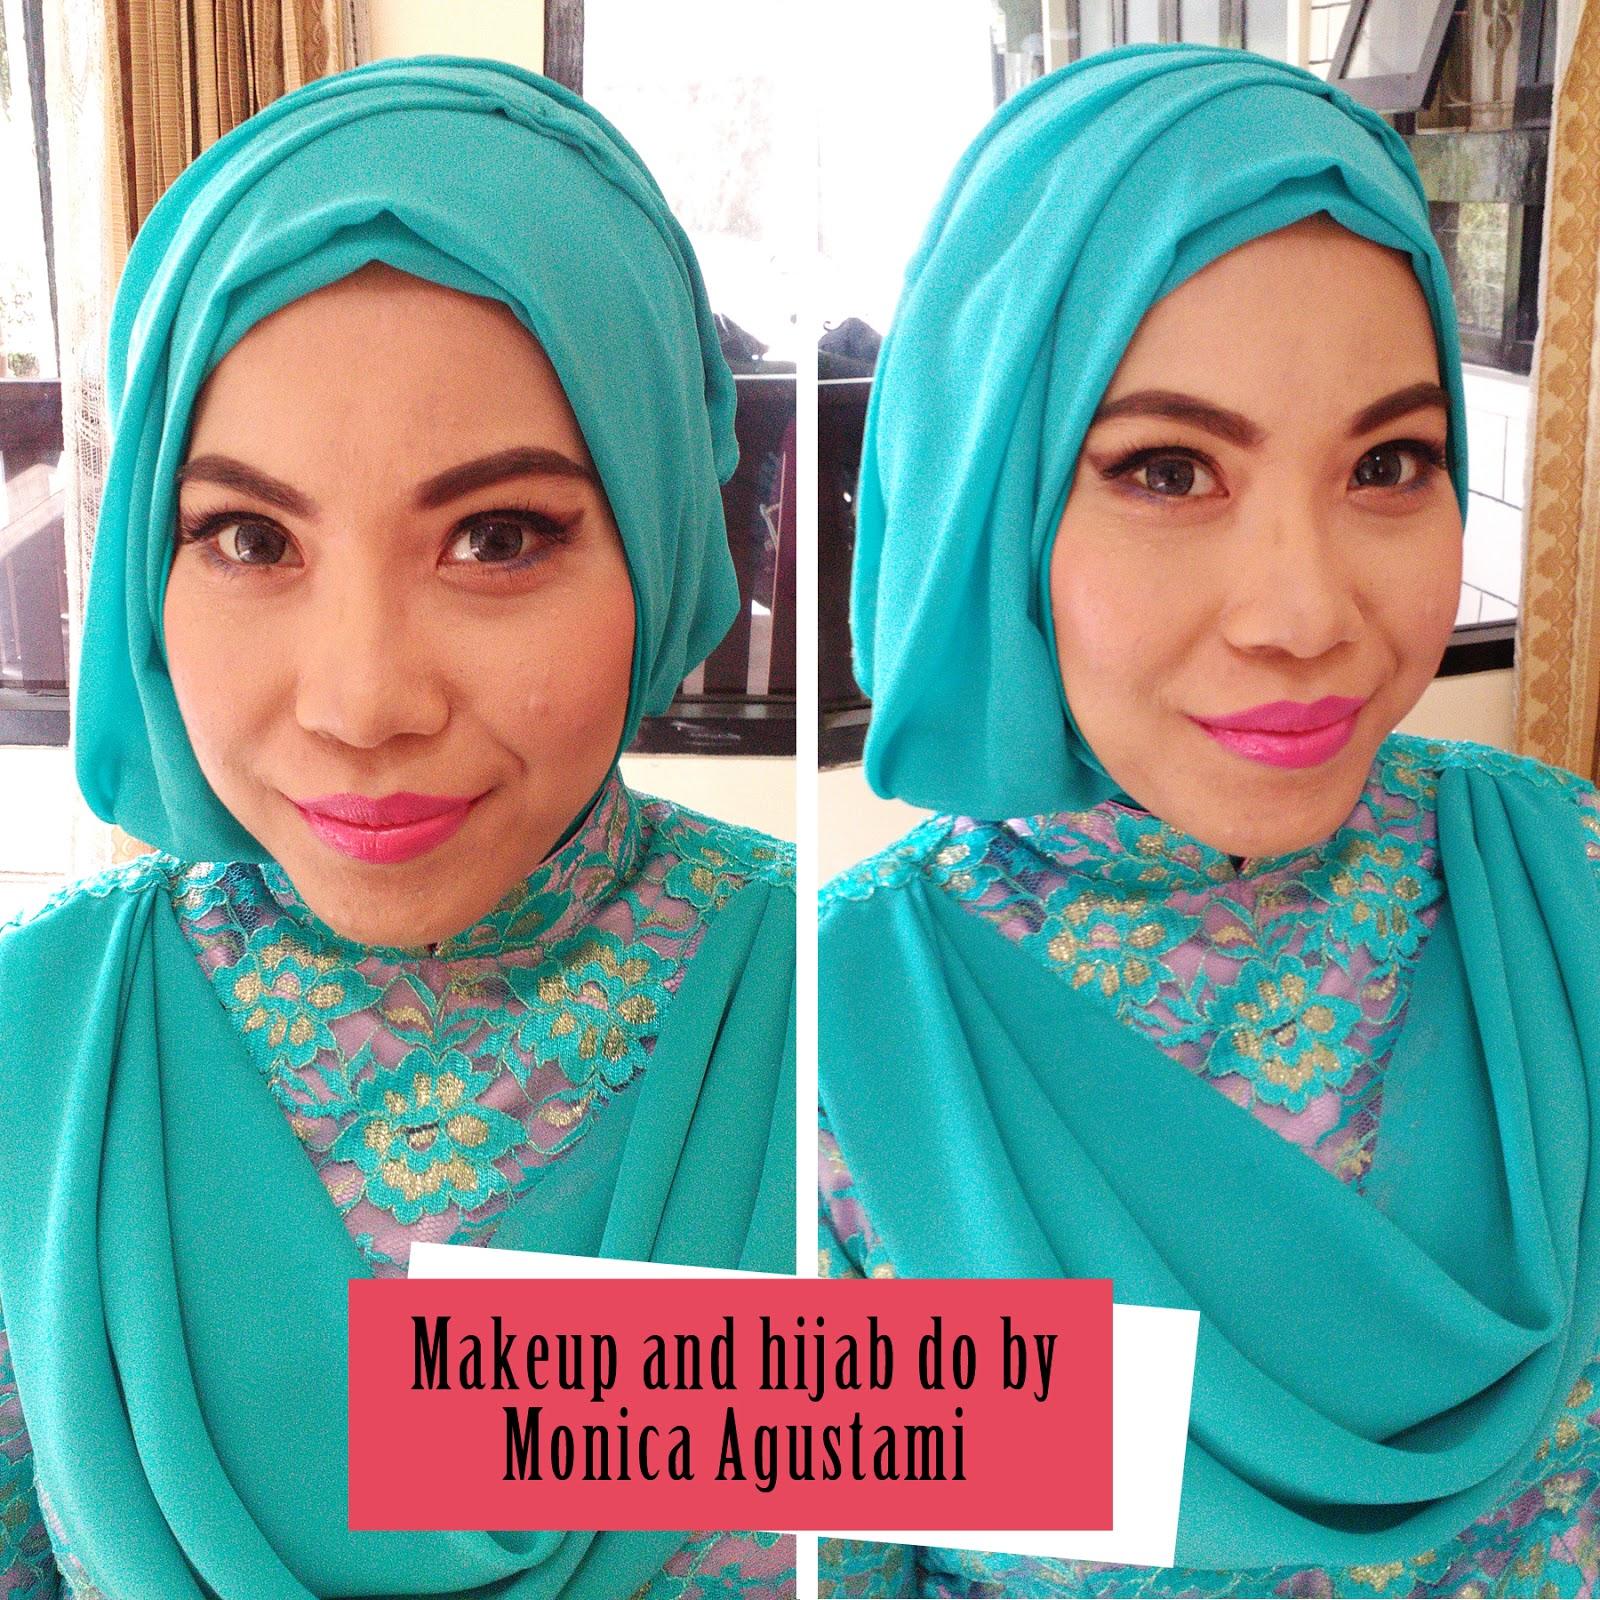 Portfolio Makeup By Monica Agustami Juli Agustus Monica Agustami